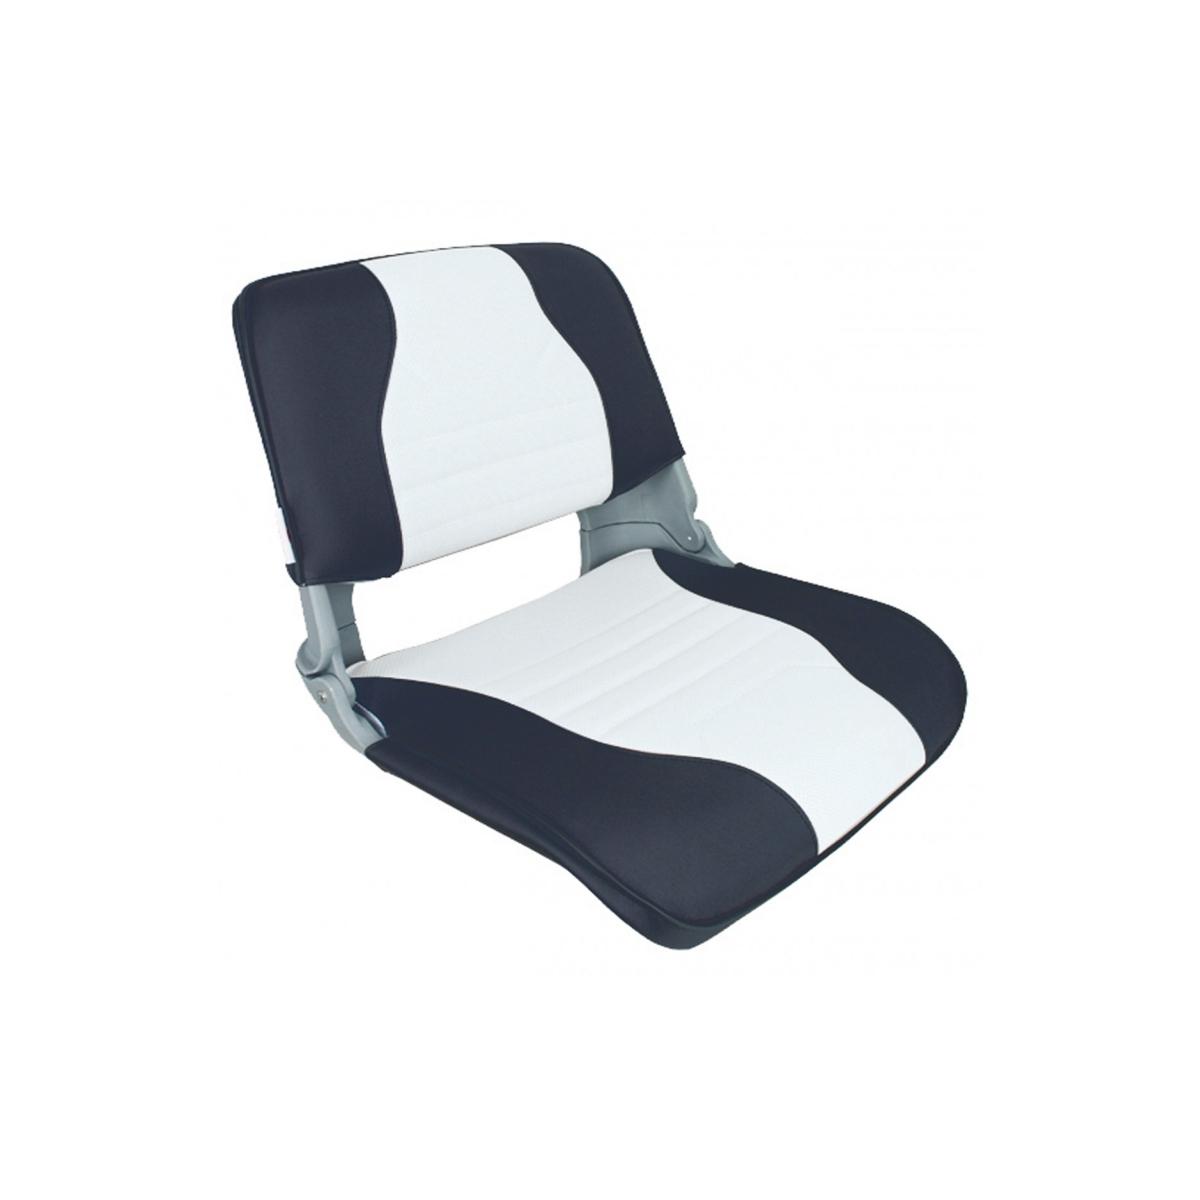 SKIPPER FOLDING SEAT